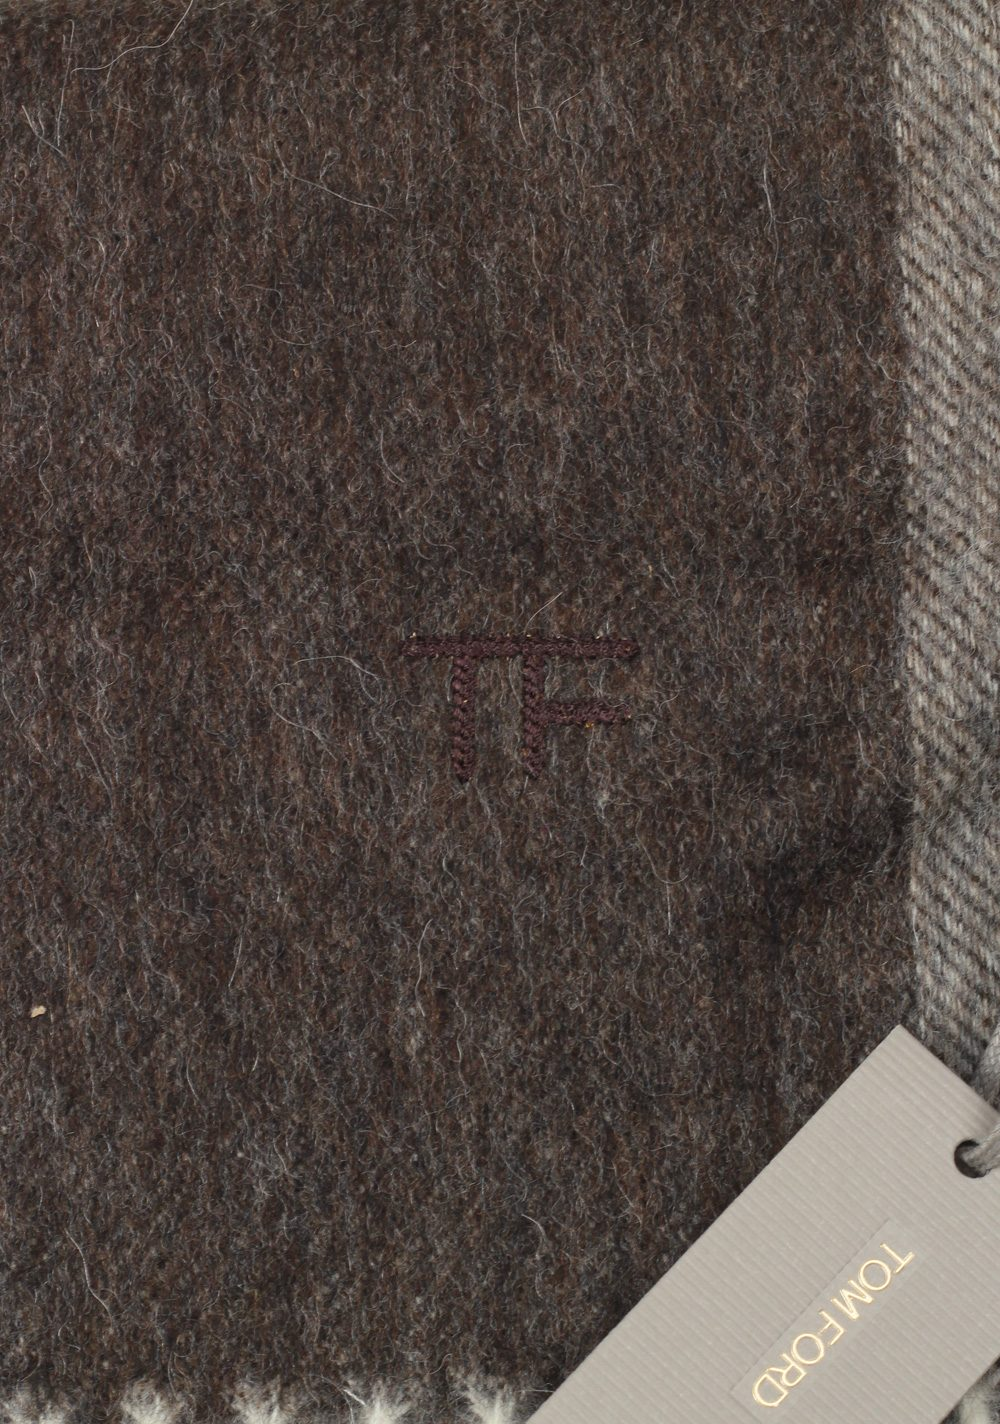 Tom Ford Brown Wool Alpaca Cashmere Signature Scarf 82″ / 11″ | Costume Limité